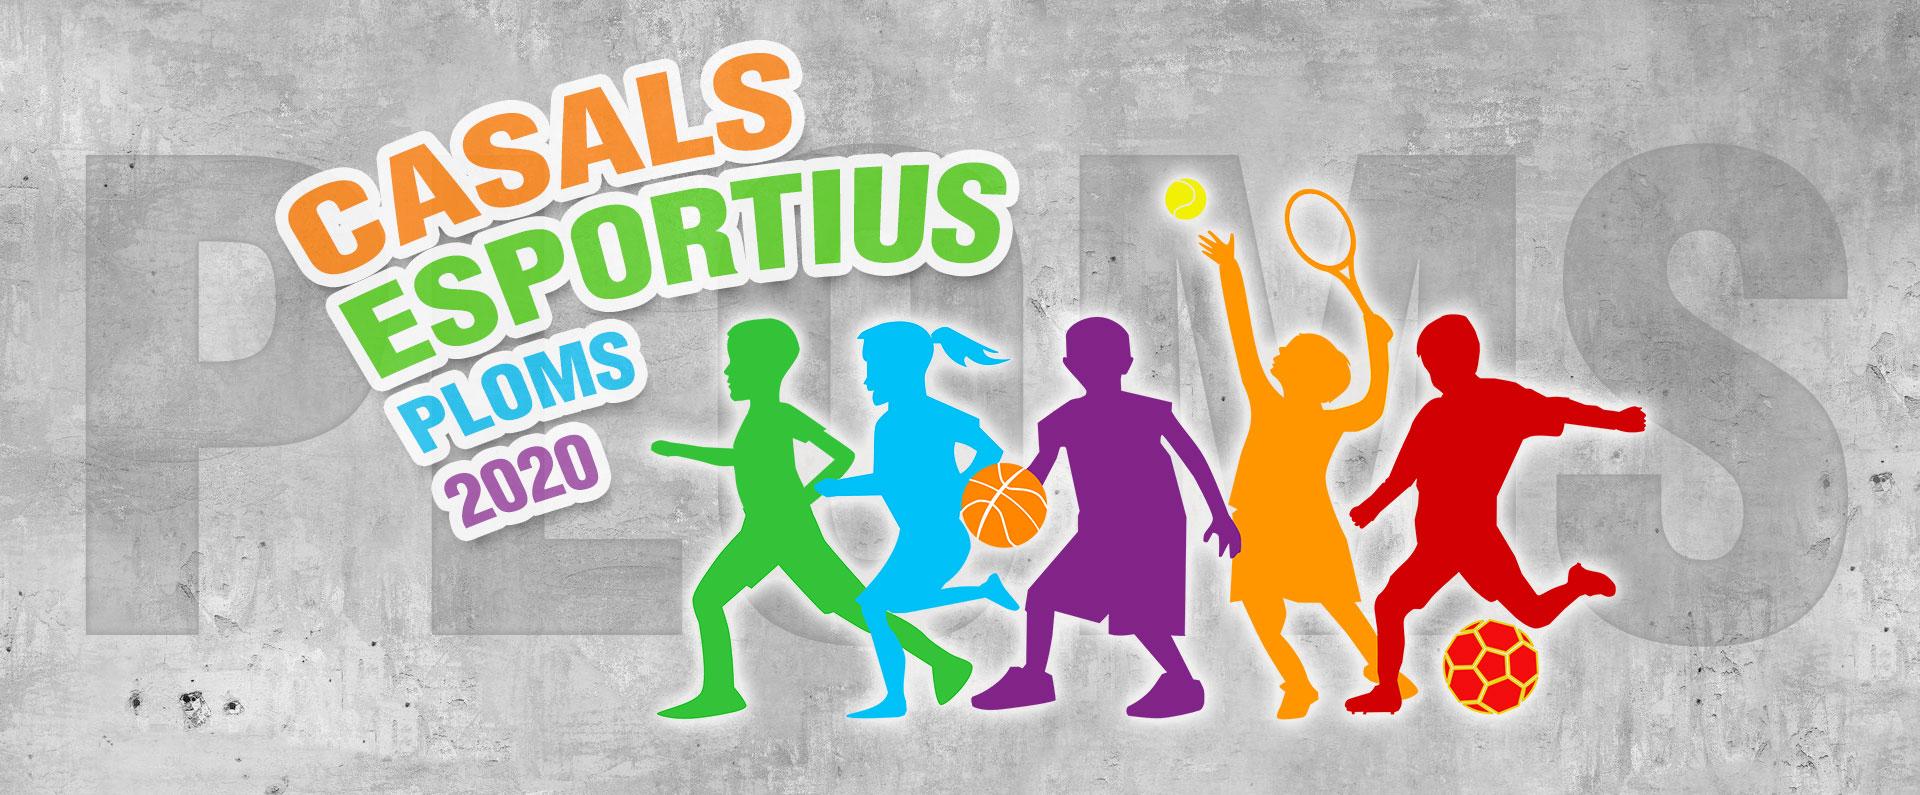 Imatge cartell Casals Esportius 2020